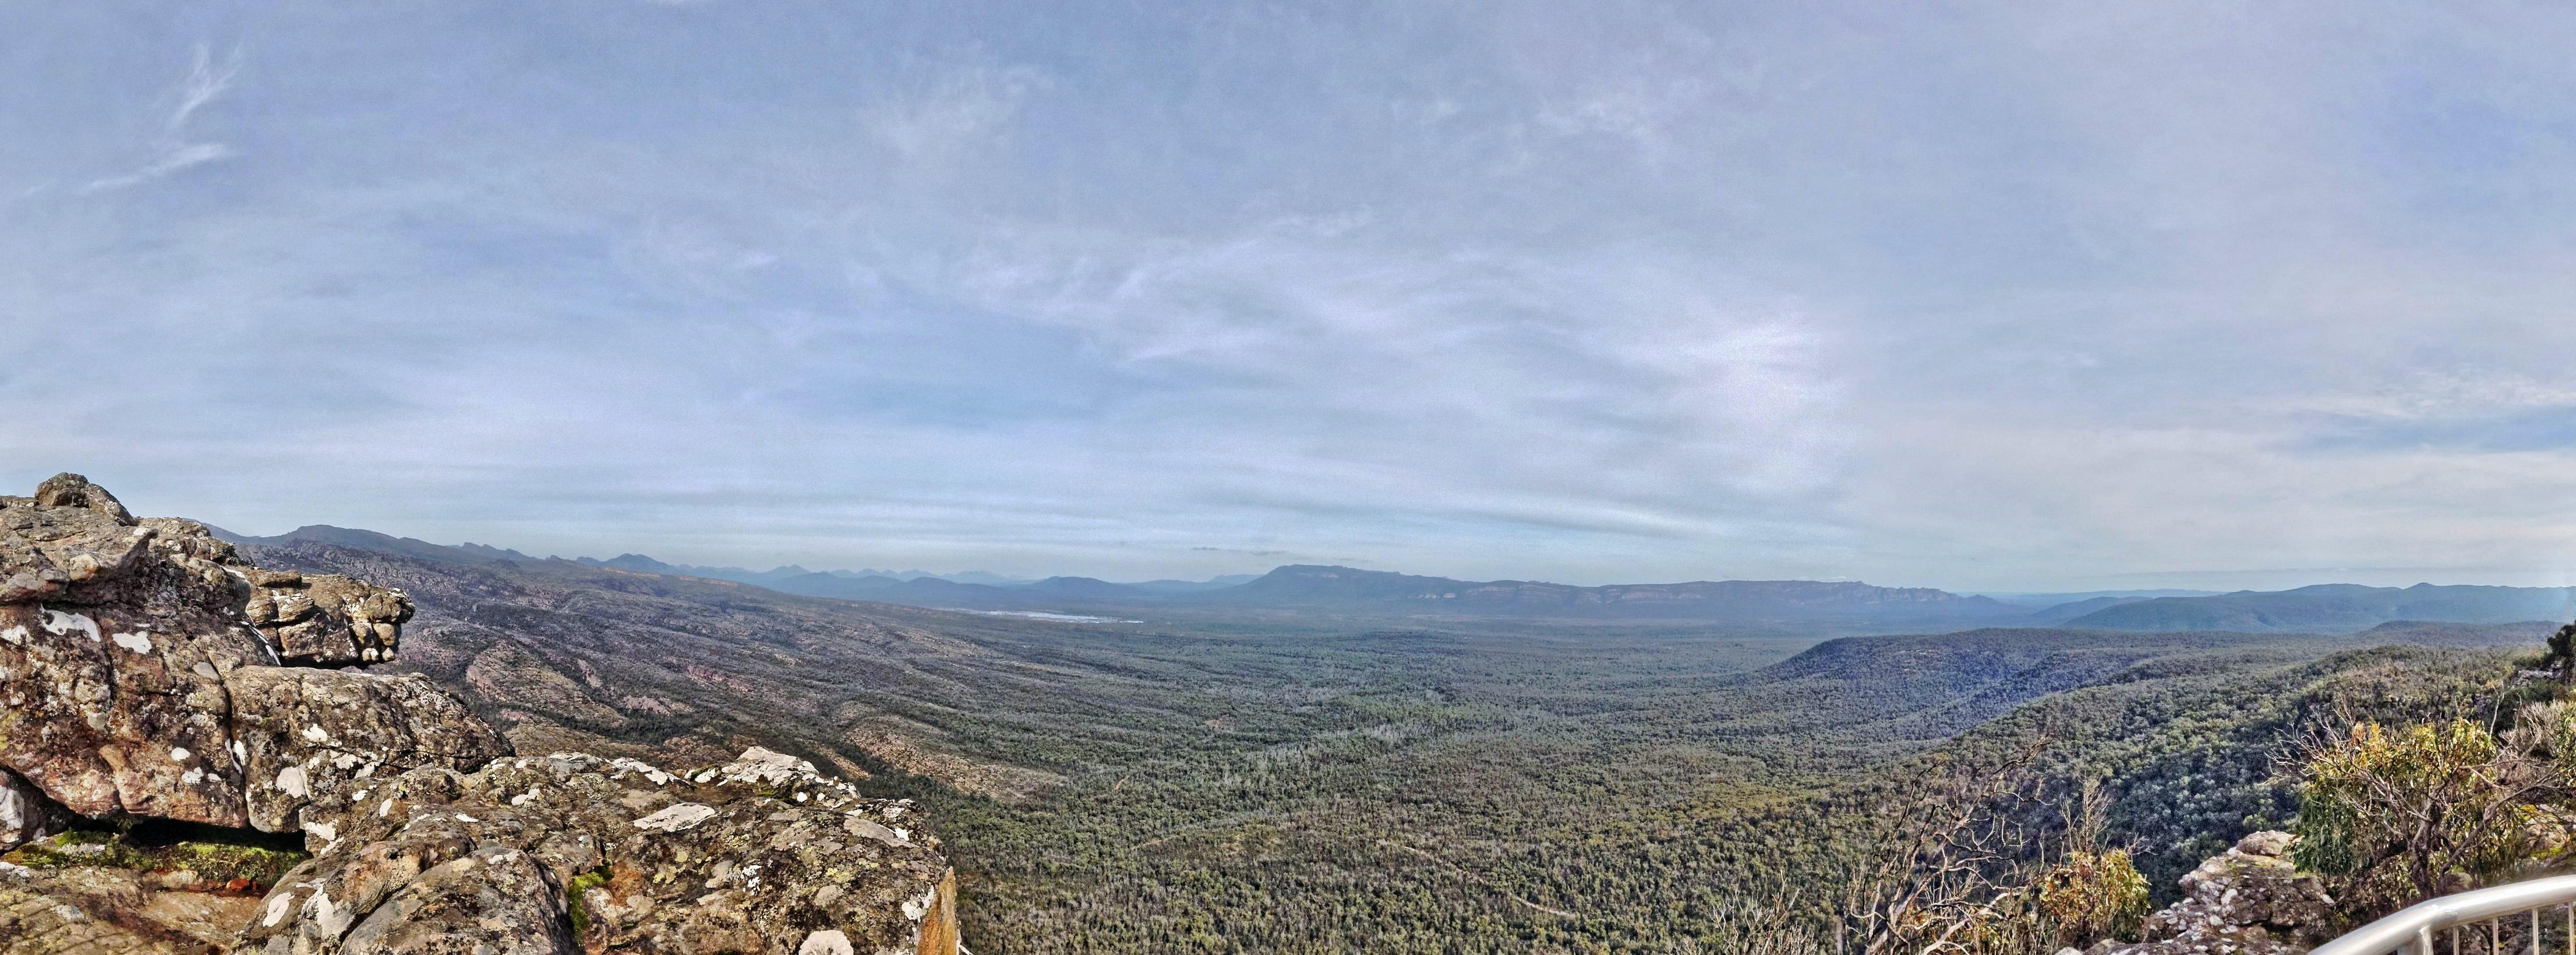 Grampians-panorama.jpeg